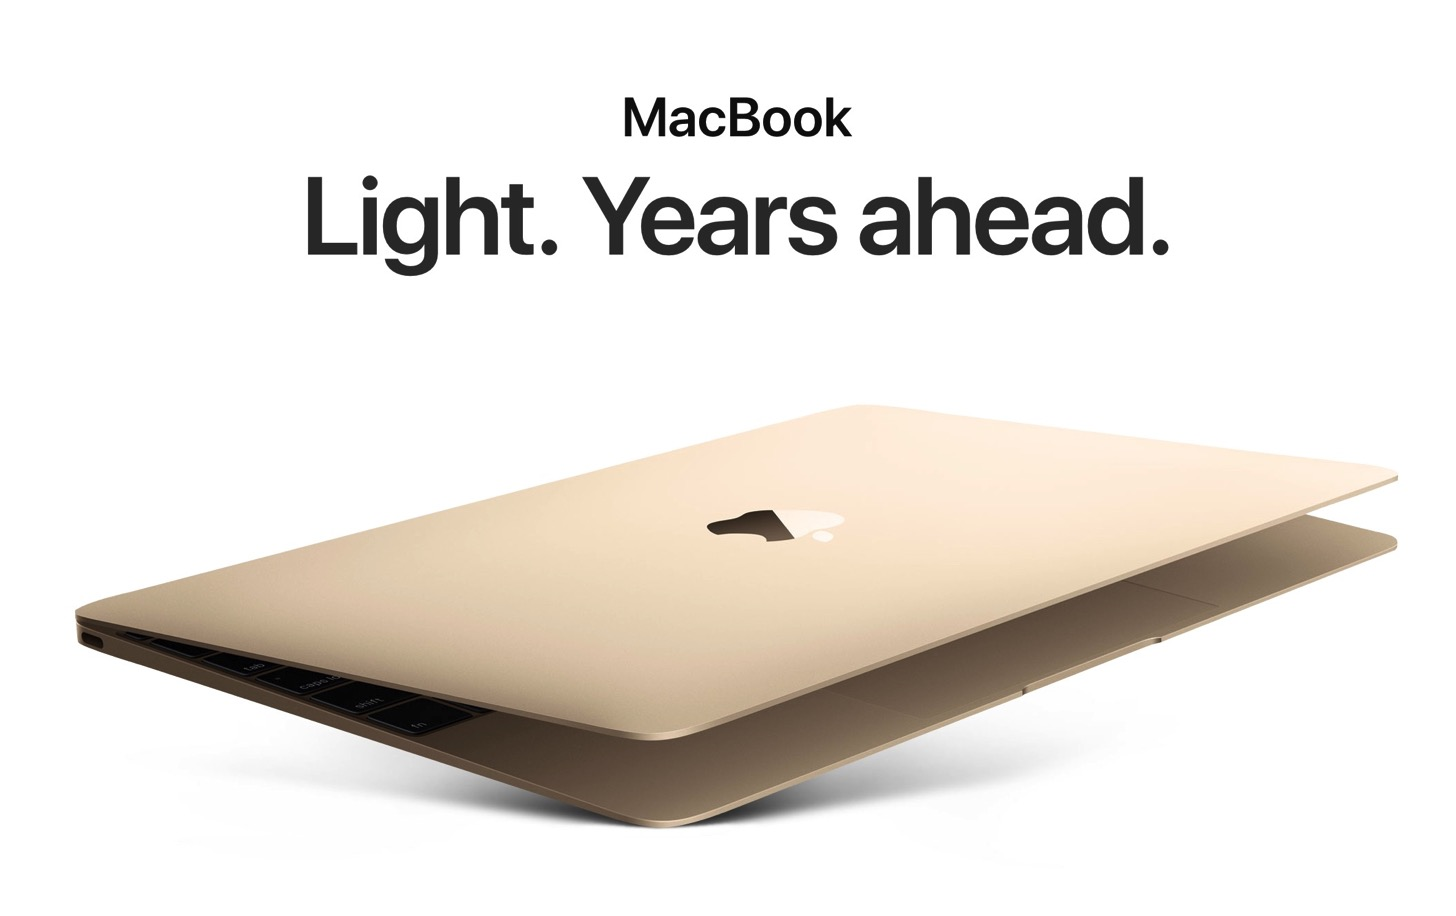 Kaby Lakeを採用したMacBook